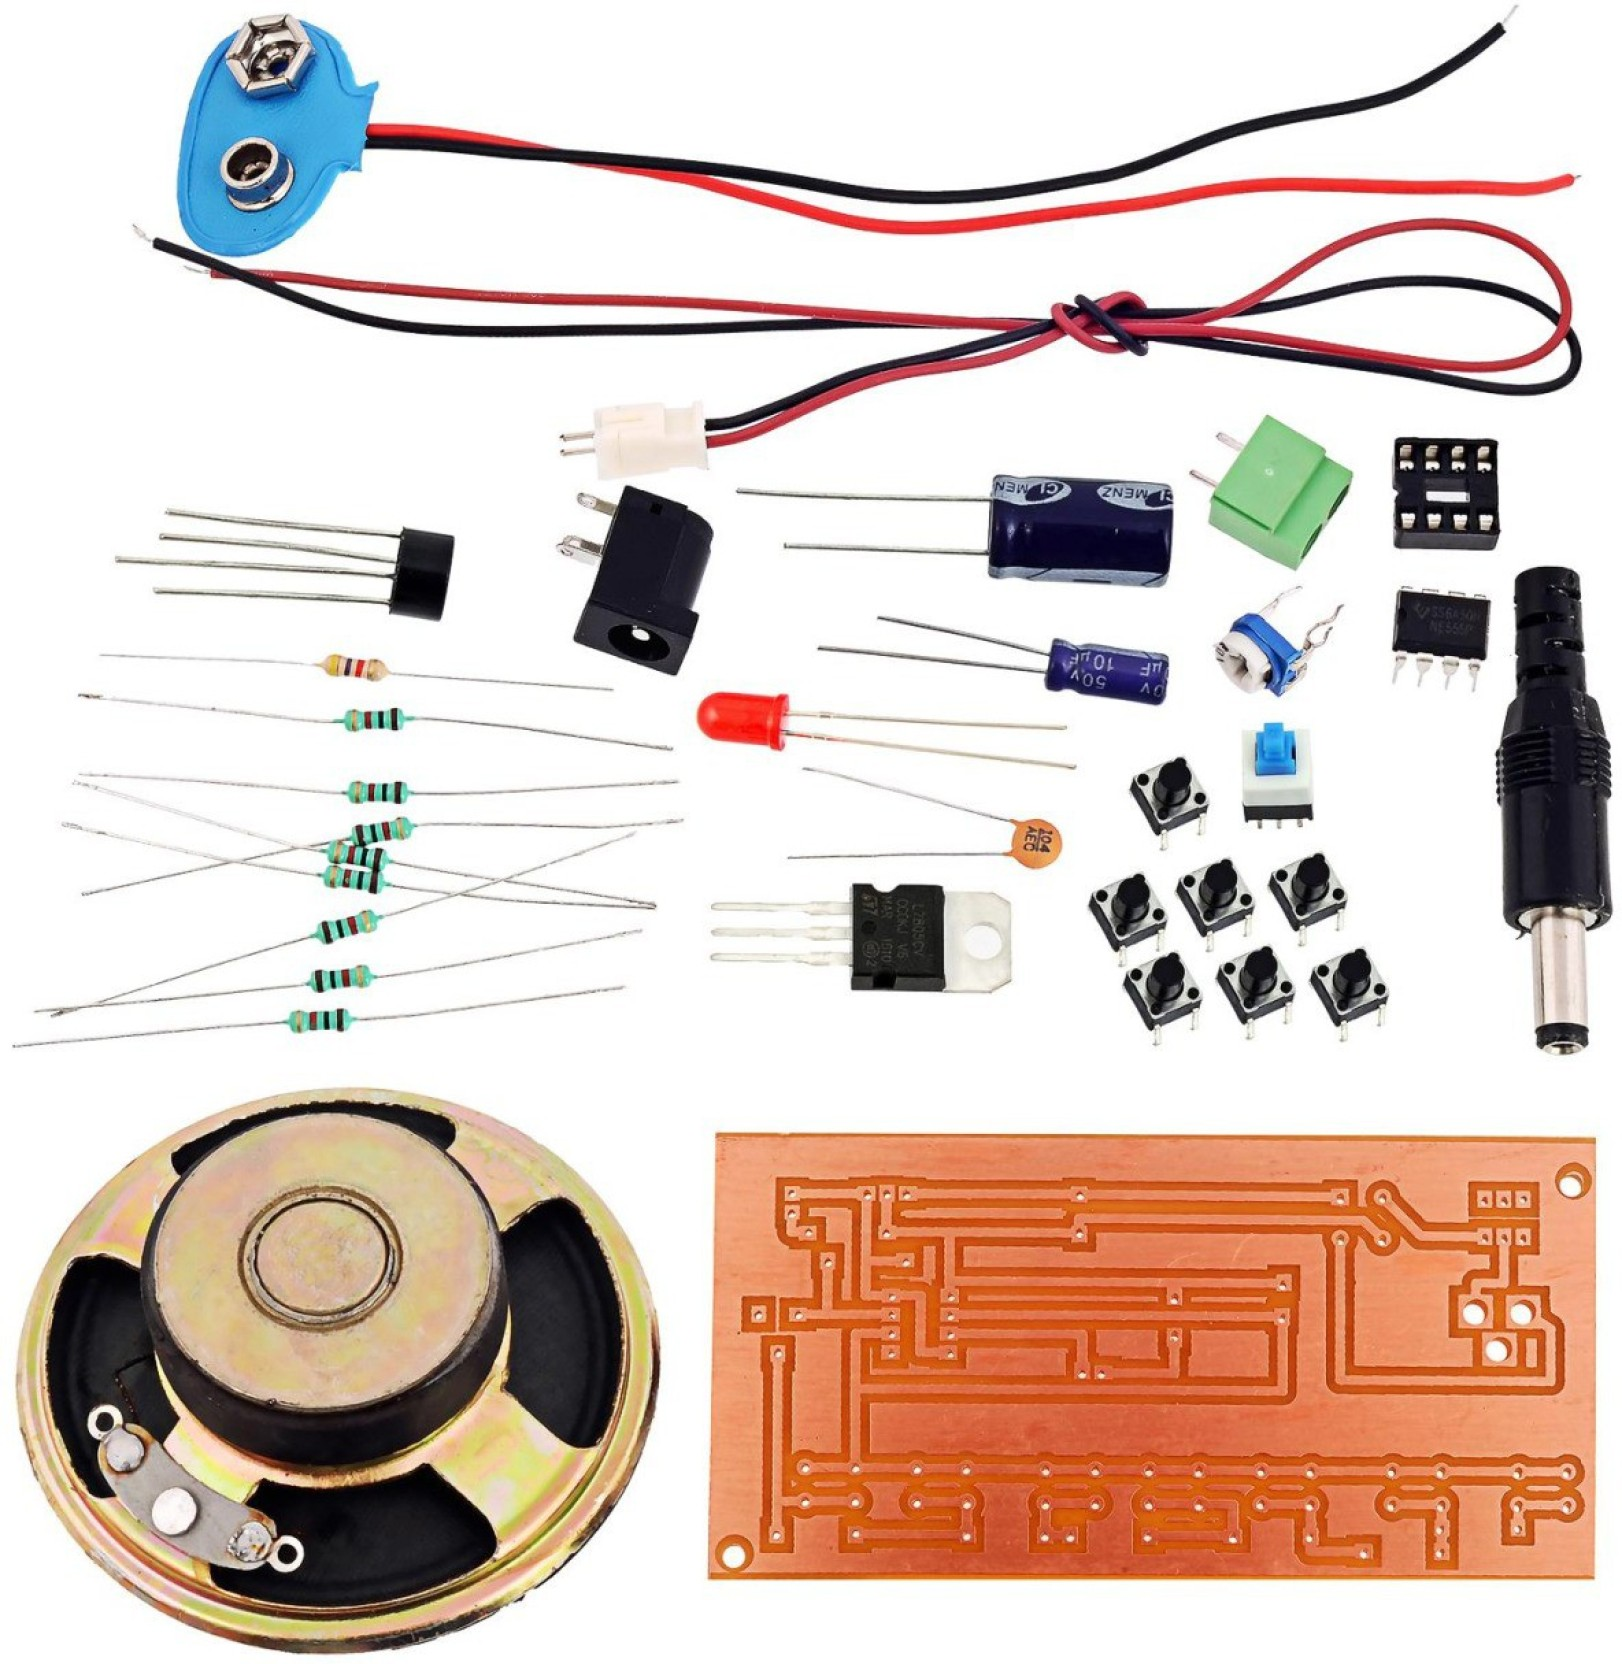 Kitsguru Toy Organ Cum Mini Casio Lgkt060 Educational Electronic Electrical Circuit Kits Add To Cart